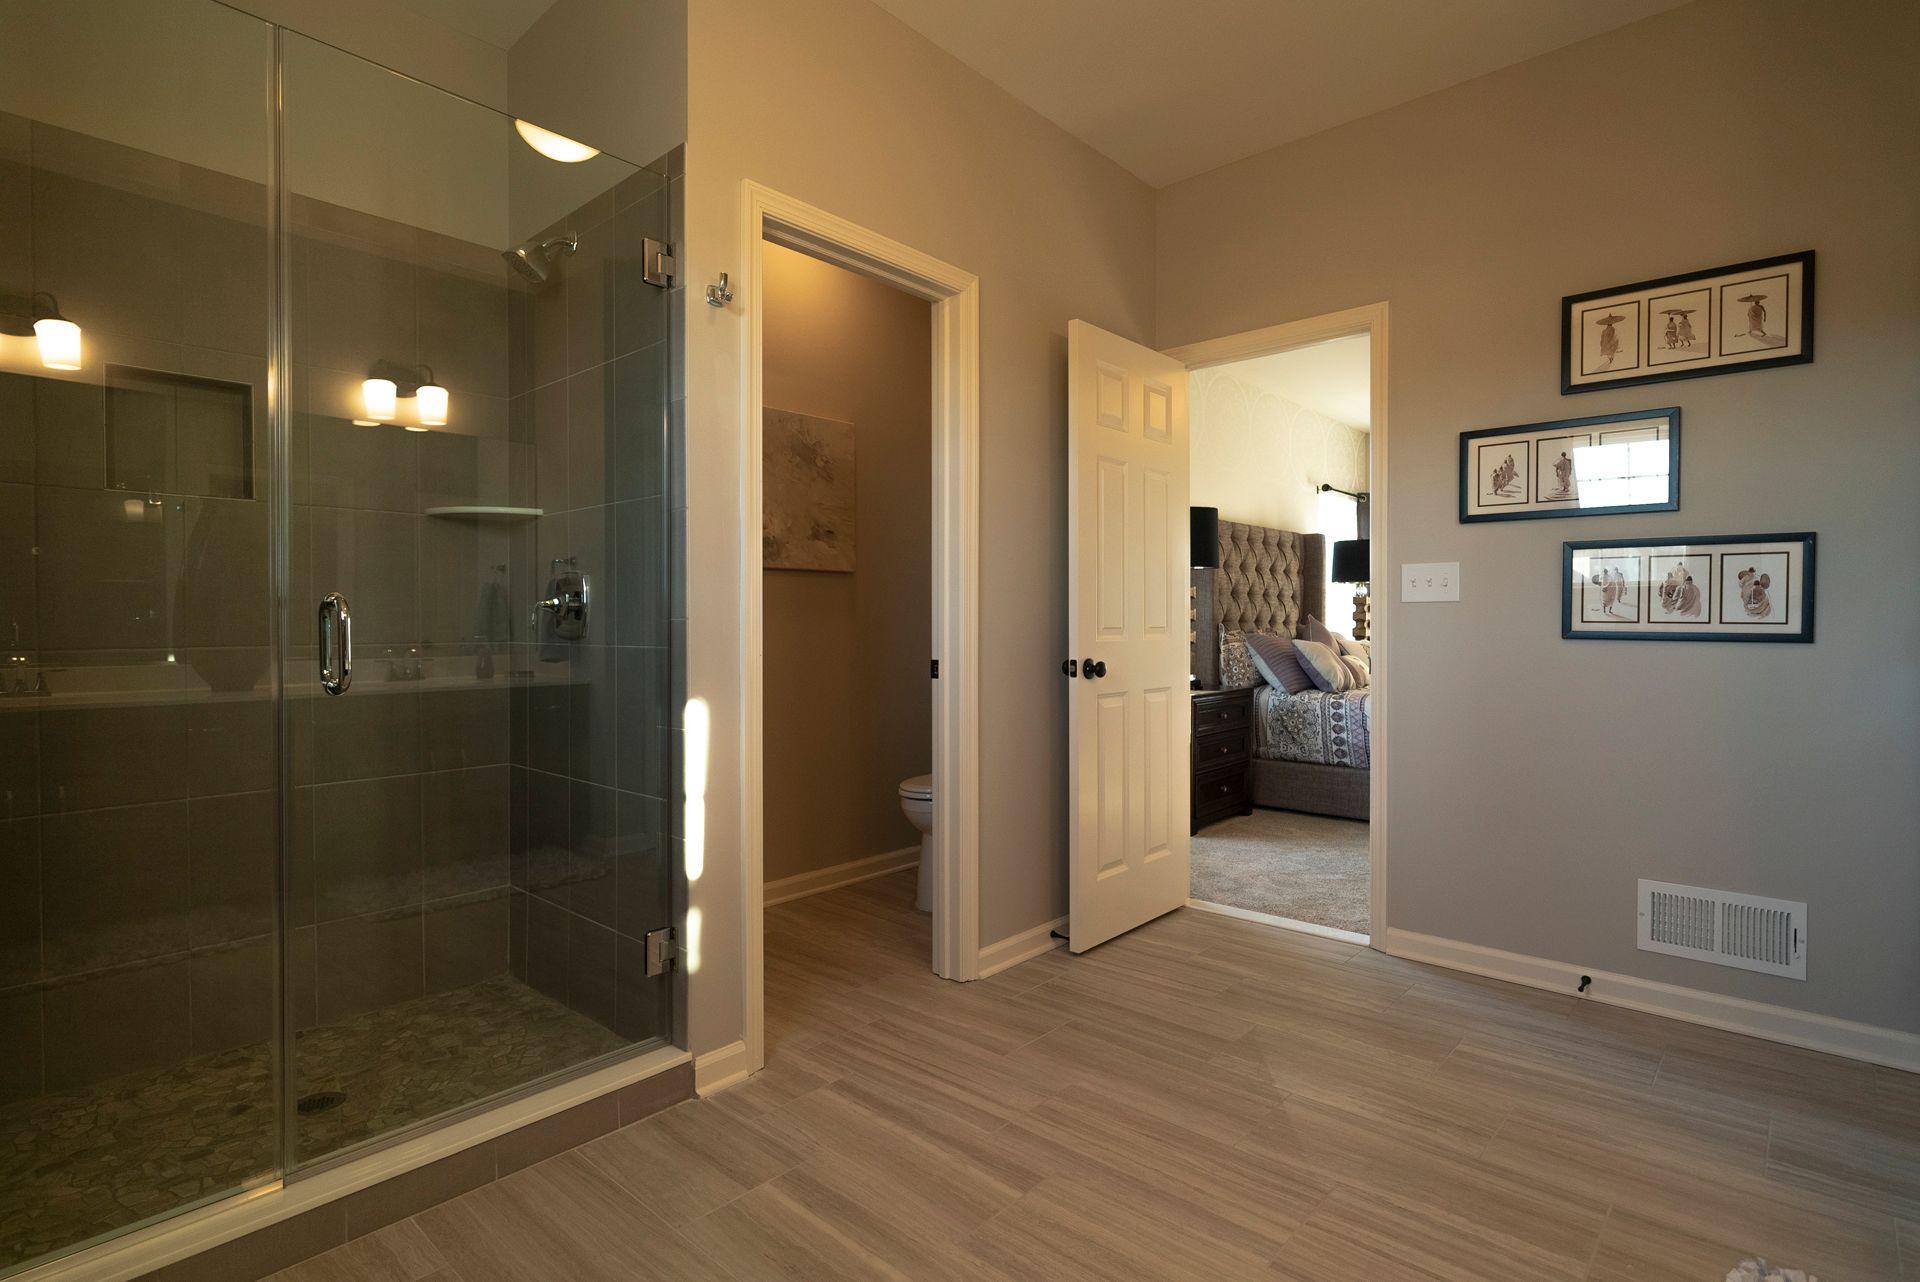 Bathroom featured in the Breckenridge Farmhouse By Tuskes Homes in Scranton-Wilkes-Barre, PA